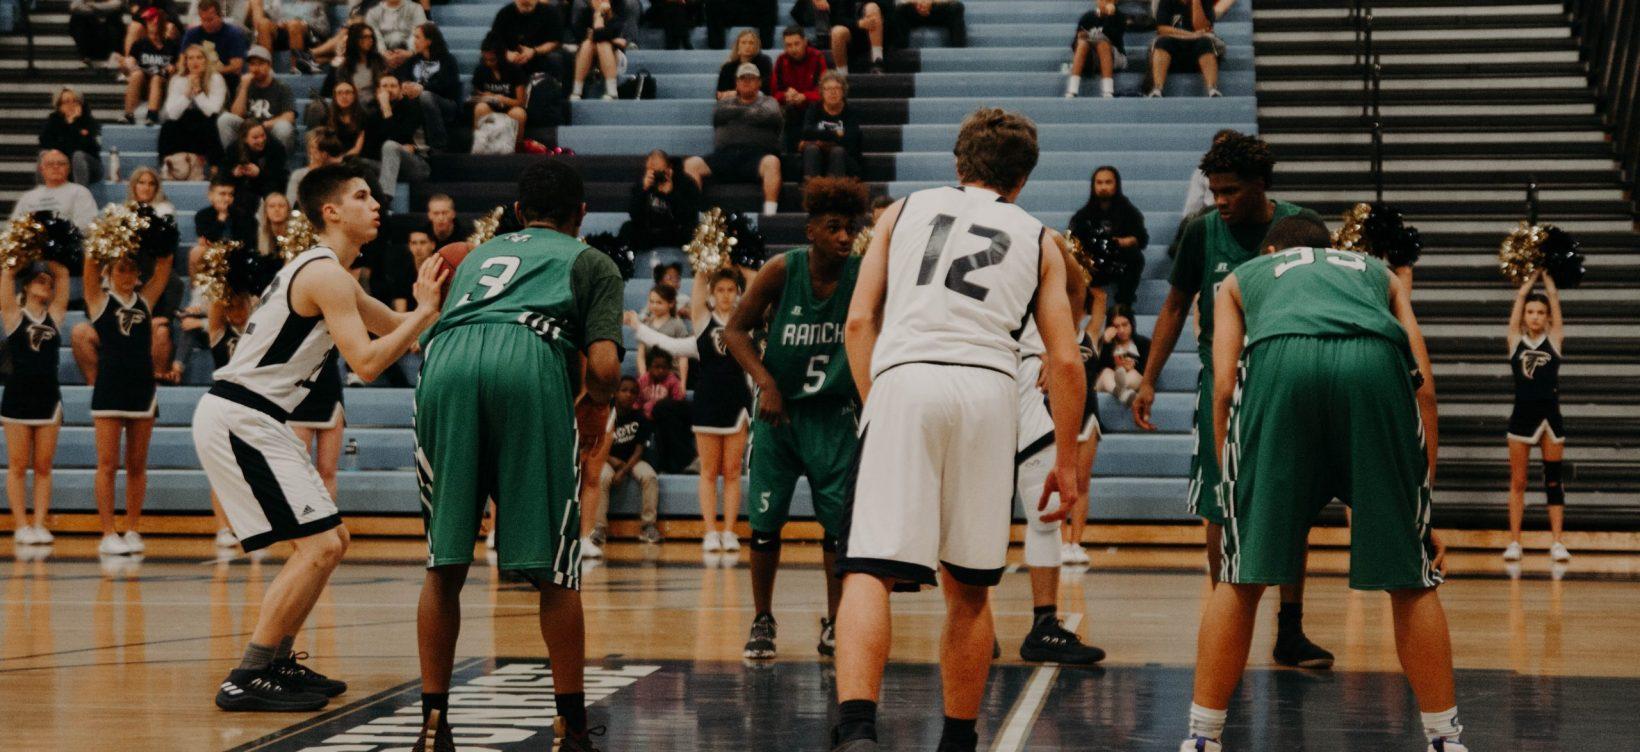 équipe de basket